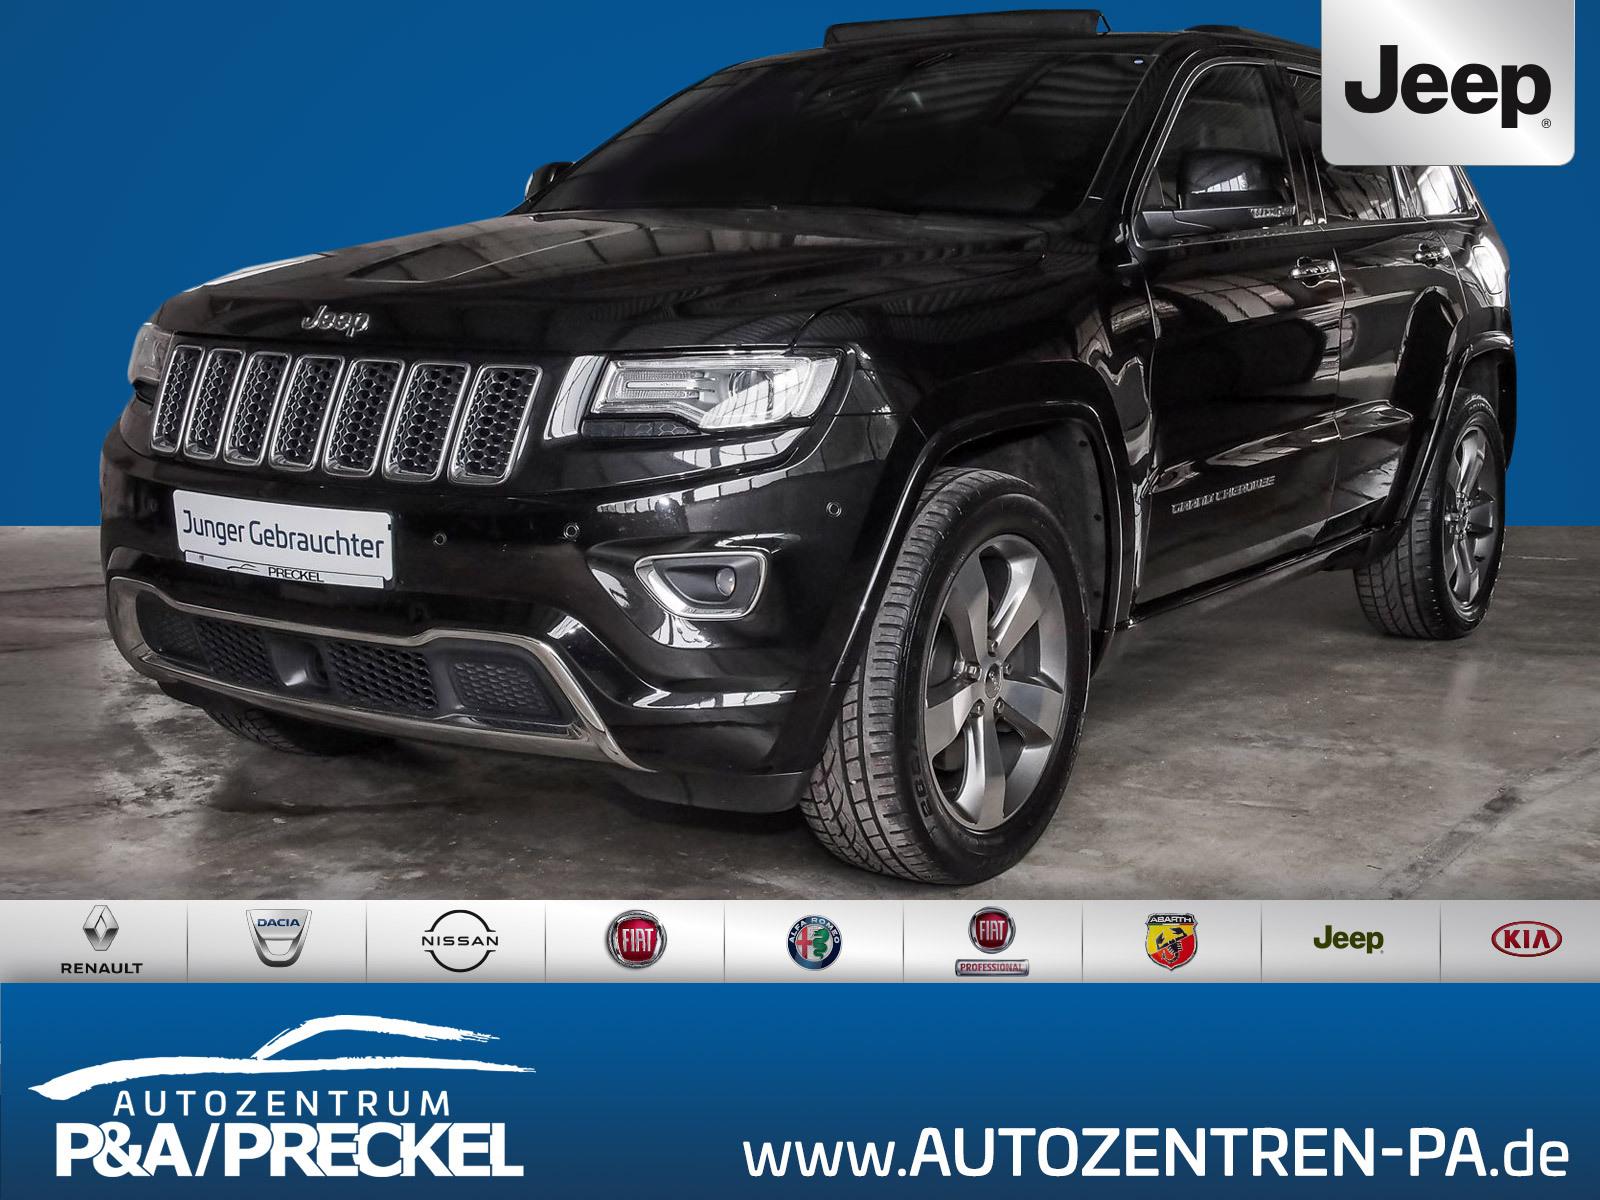 Jeep Grand Cherokee 3.0I Multijet Overland Leder / Navi / SHZ, Jahr 2017, Diesel